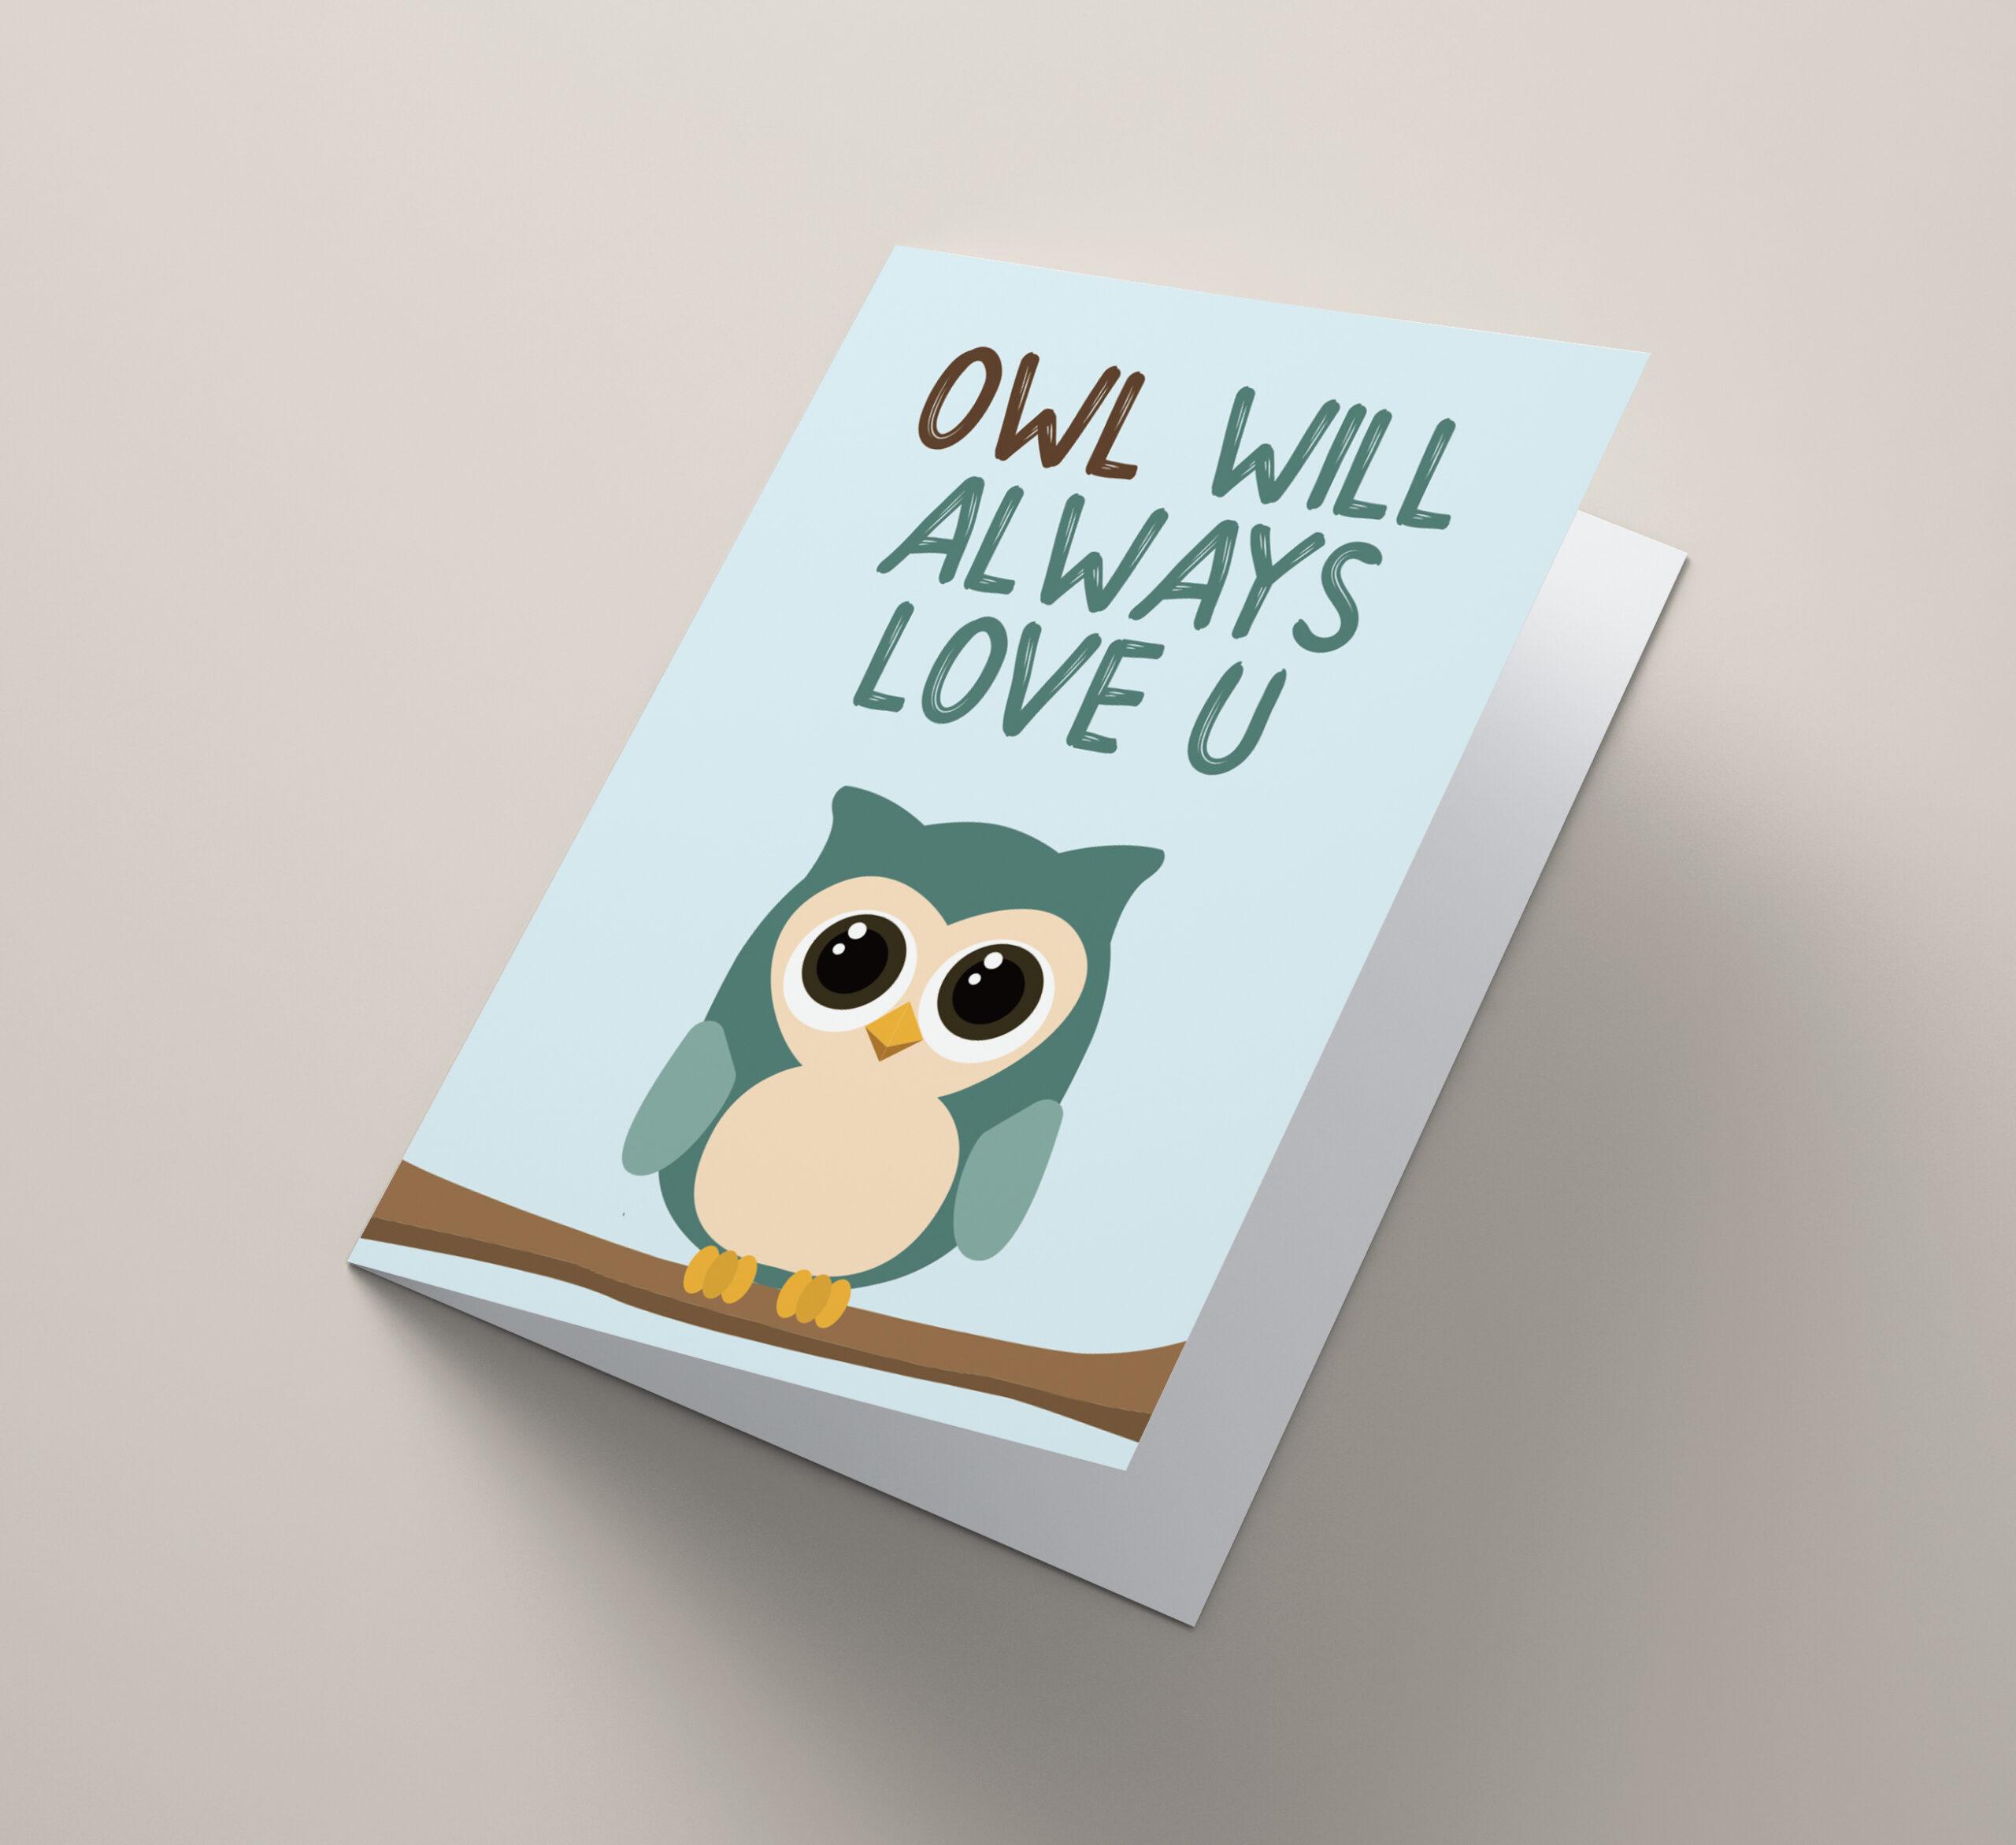 Owl Will Always Love U